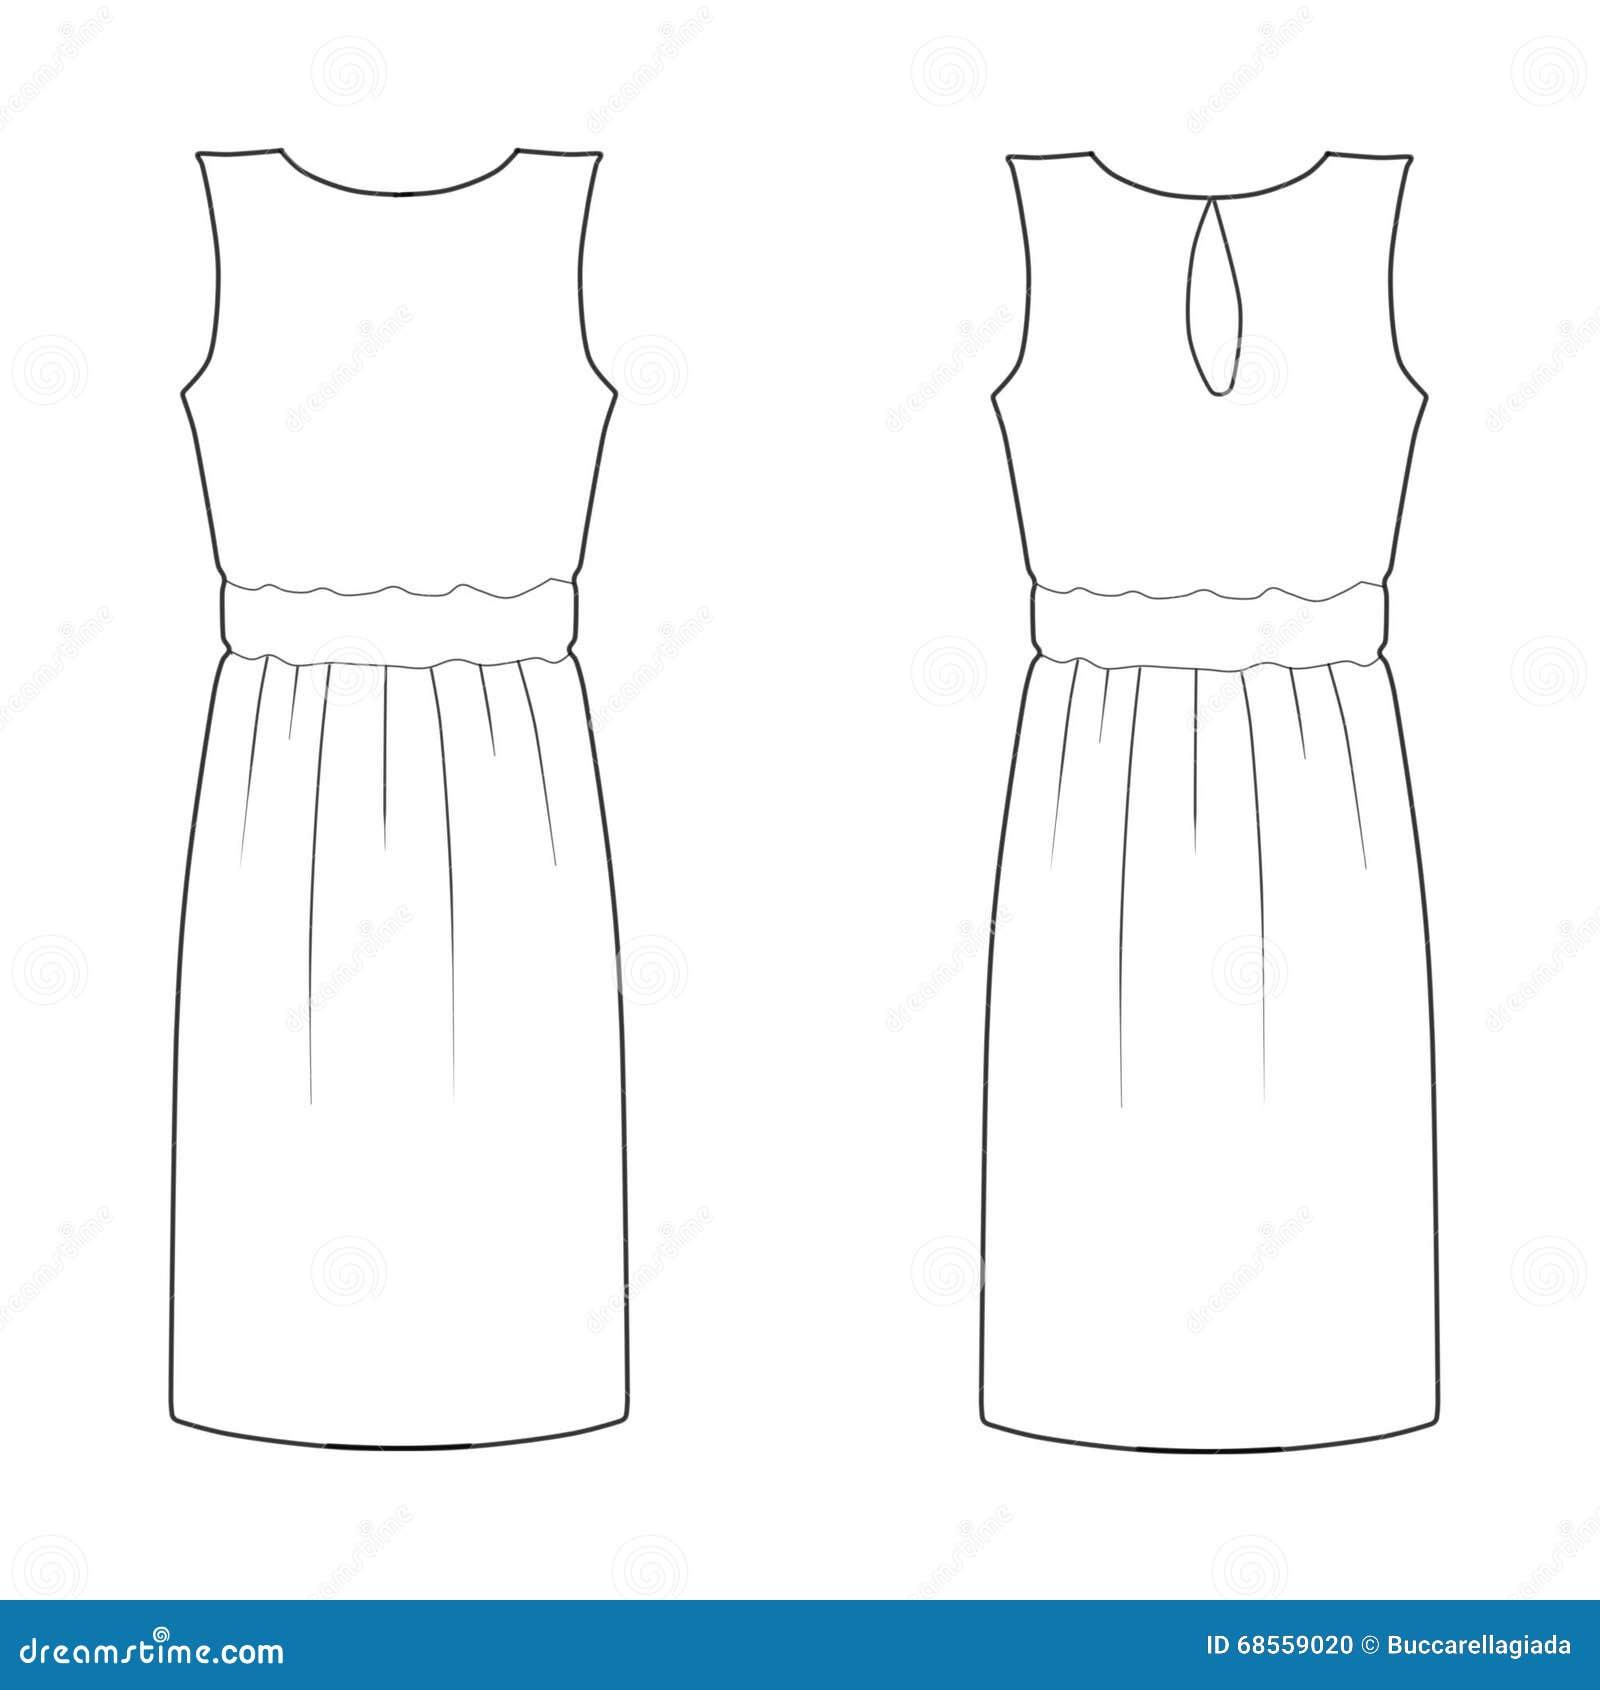 bar stool bar stool vect kingofficeus : short woman dress set fashion flat template sketch 68559020 from kingoffice.us size 1300 x 1390 jpeg 66kB